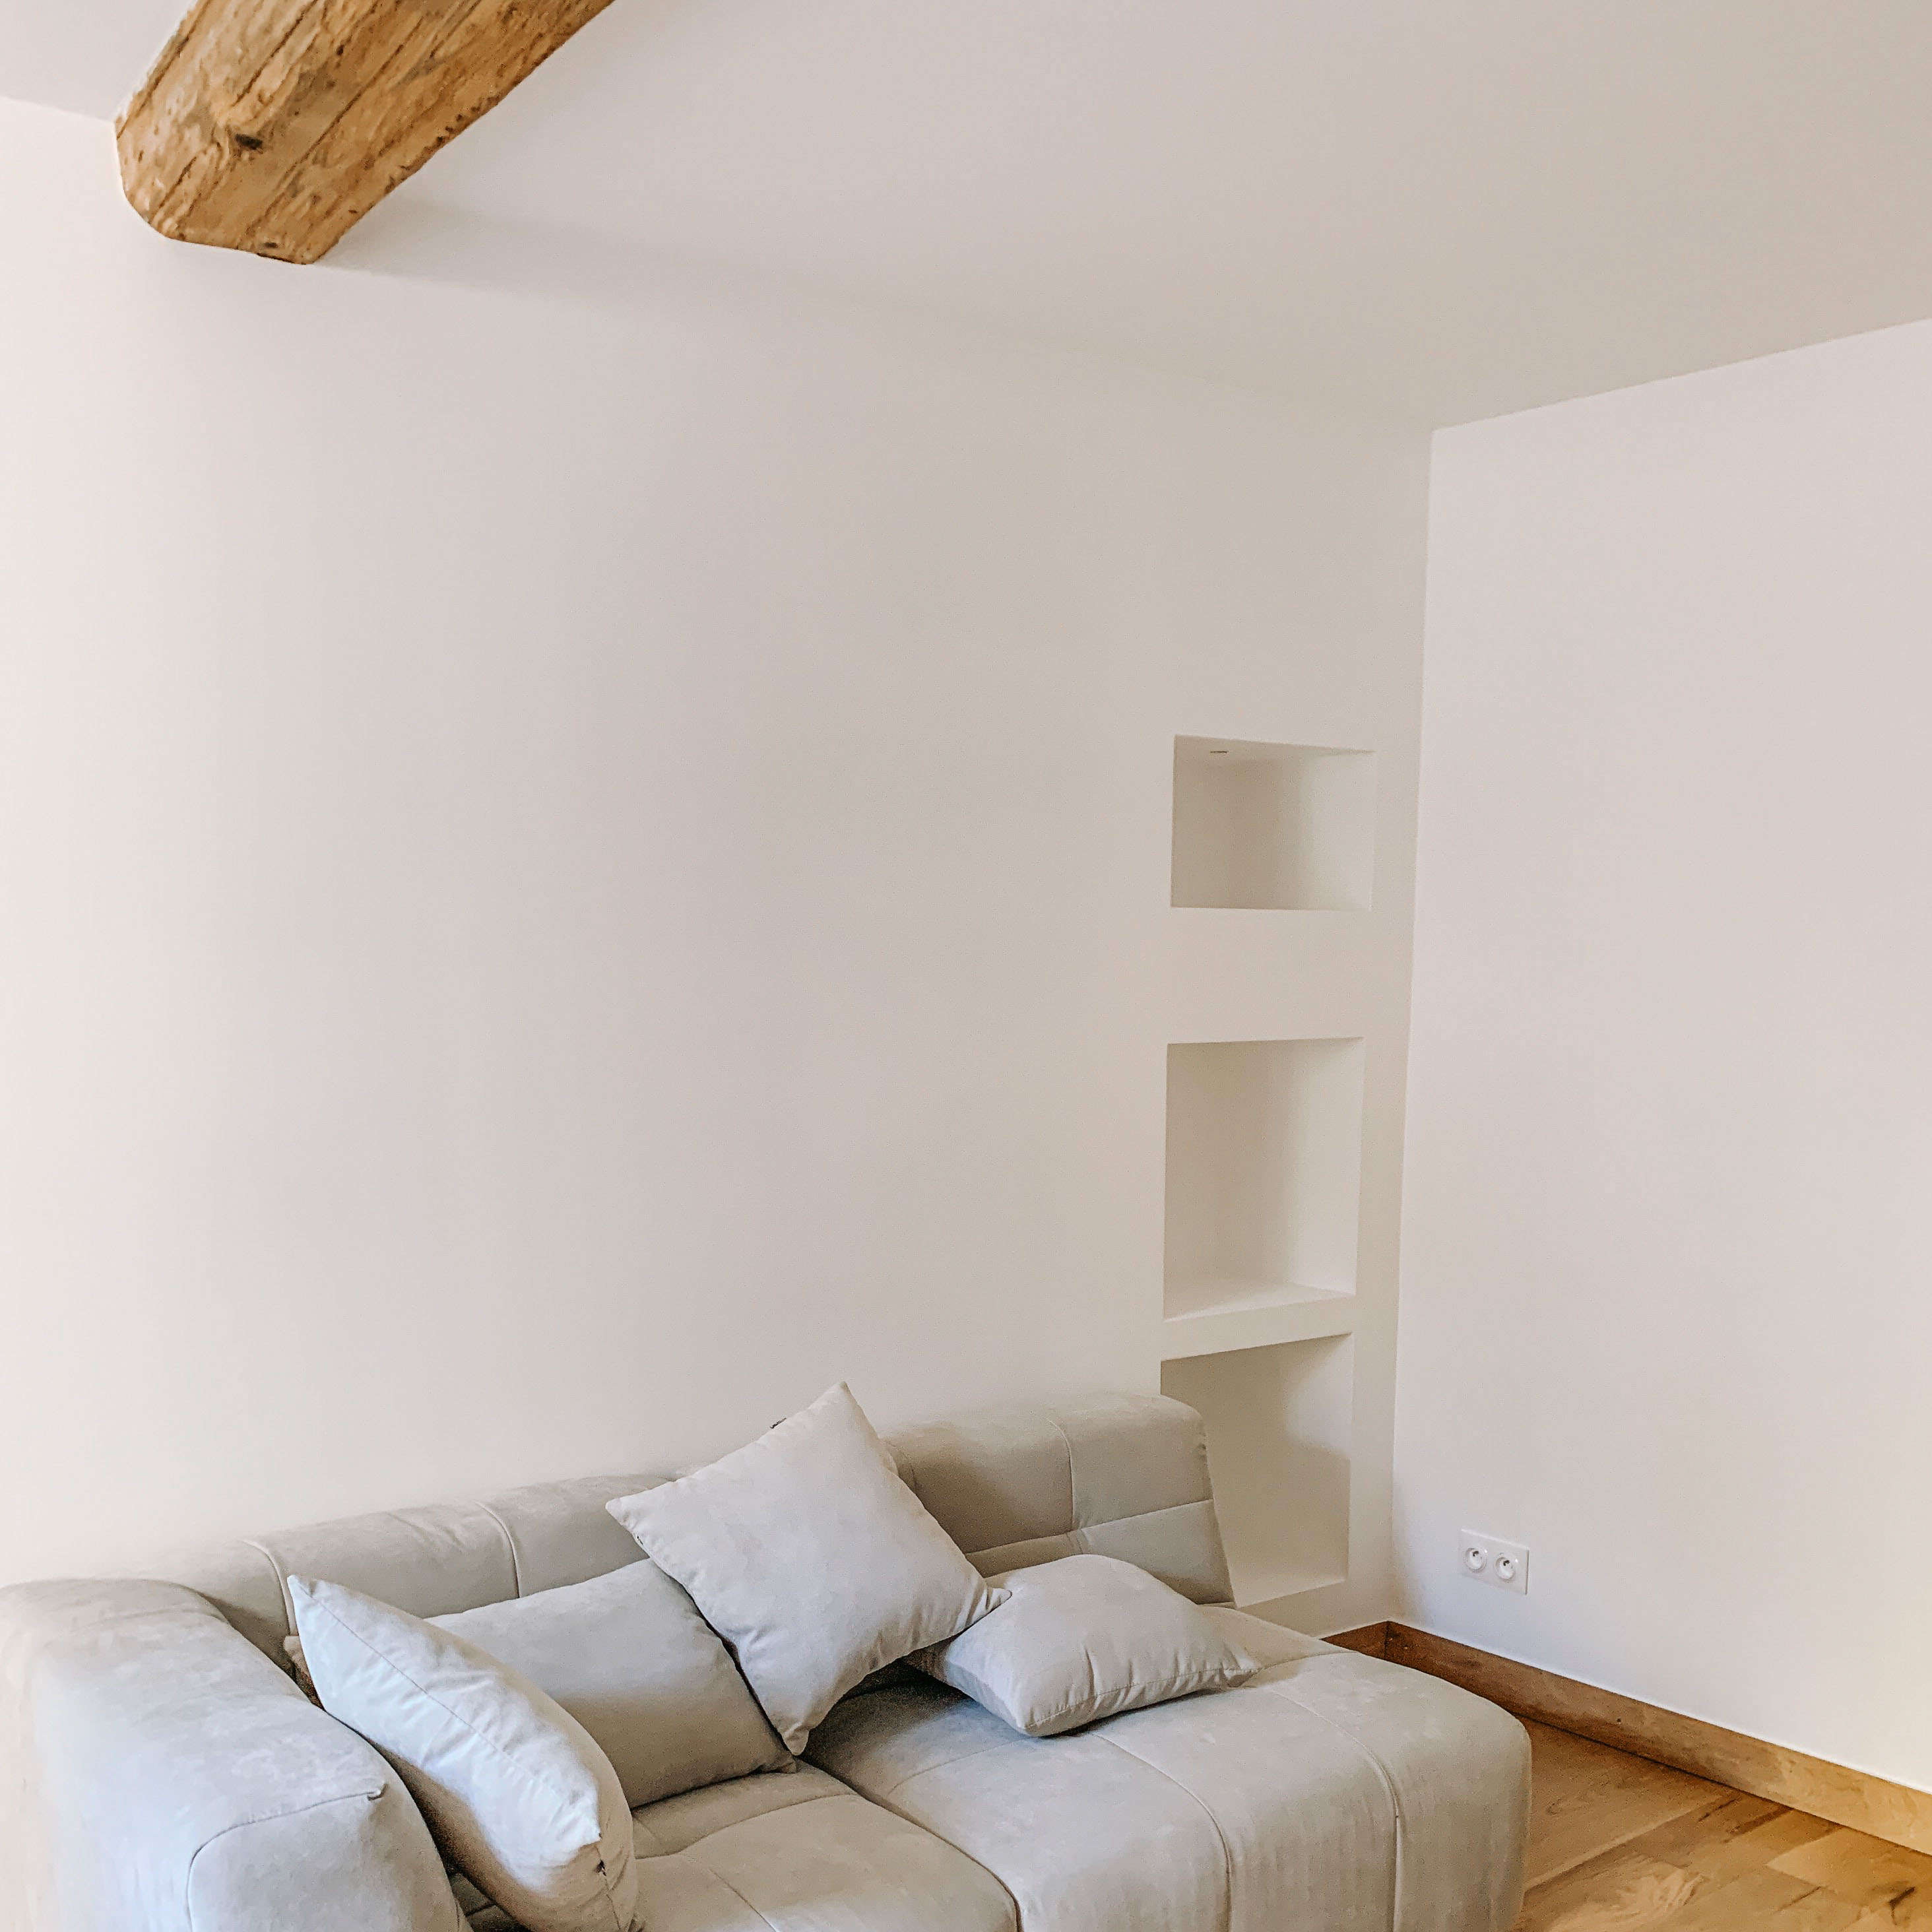 architecte-lyon-rénovation-presbytere-marcilly-azergues-pierre-dorée